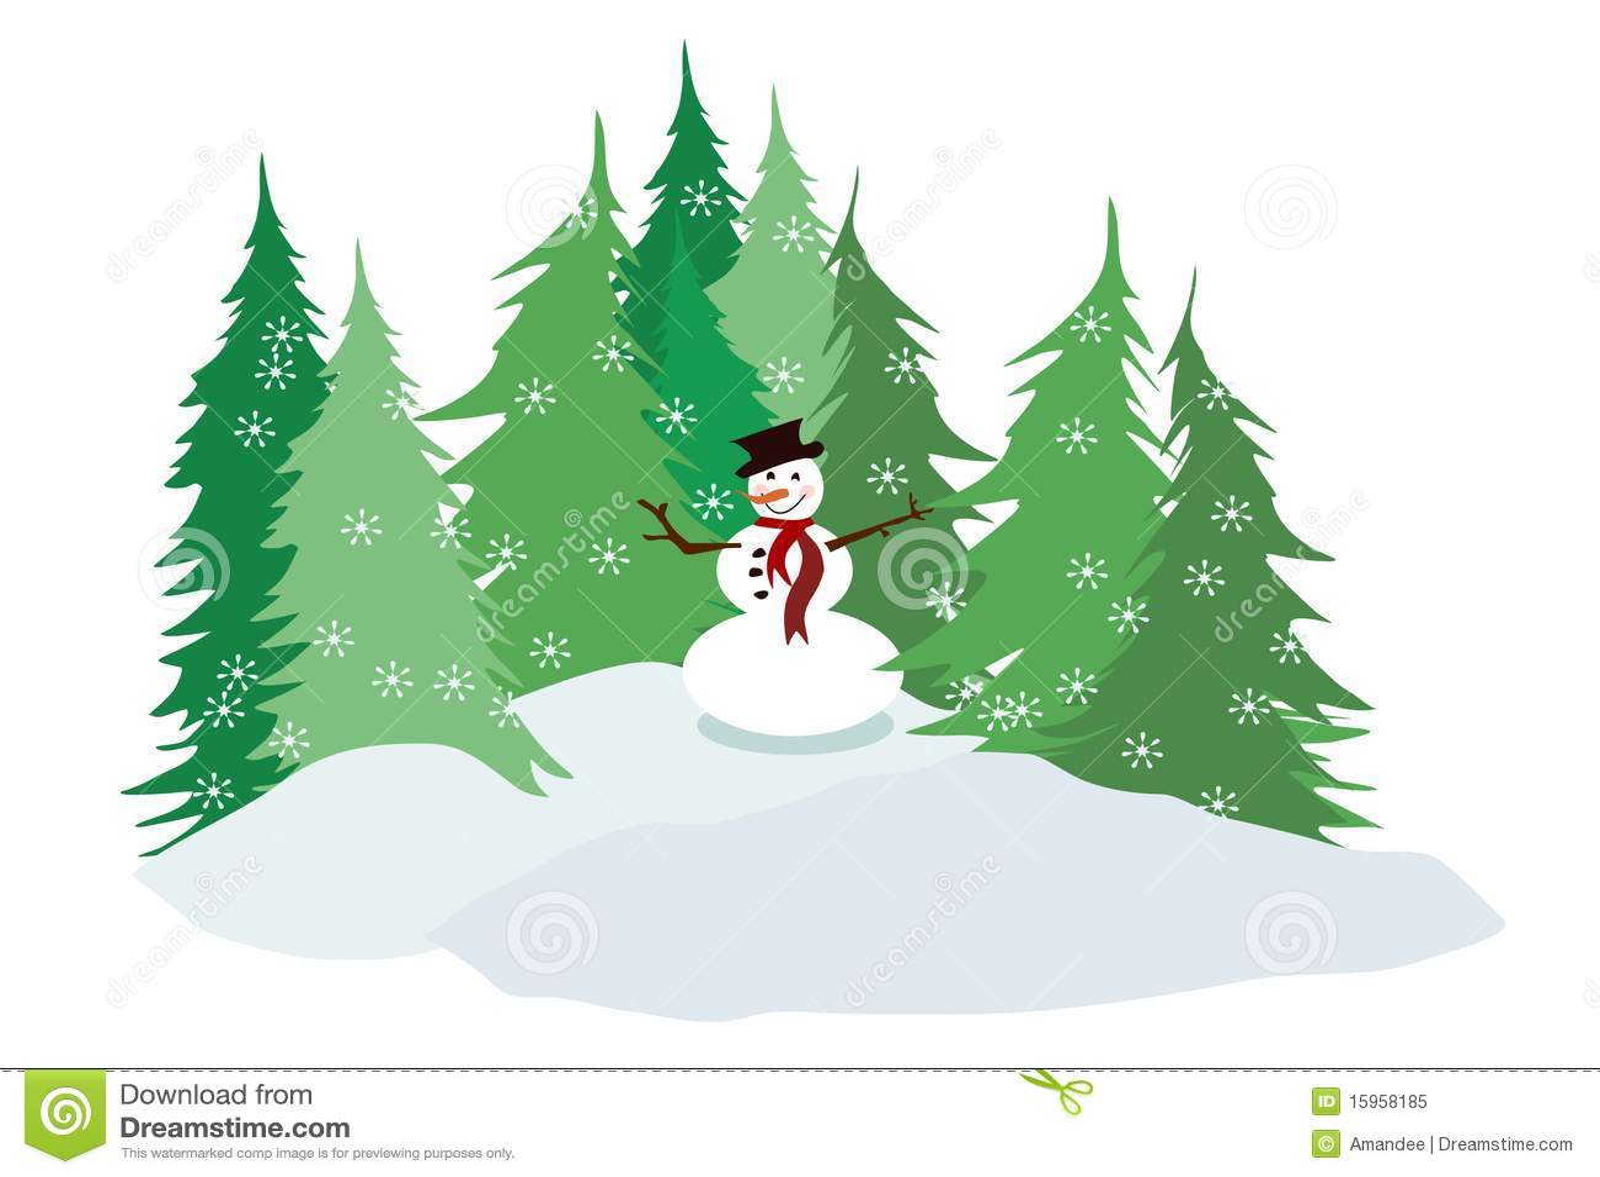 Wallpaper Falling Snow Snowman And Pine Trees Stock Illustration Illustration Of